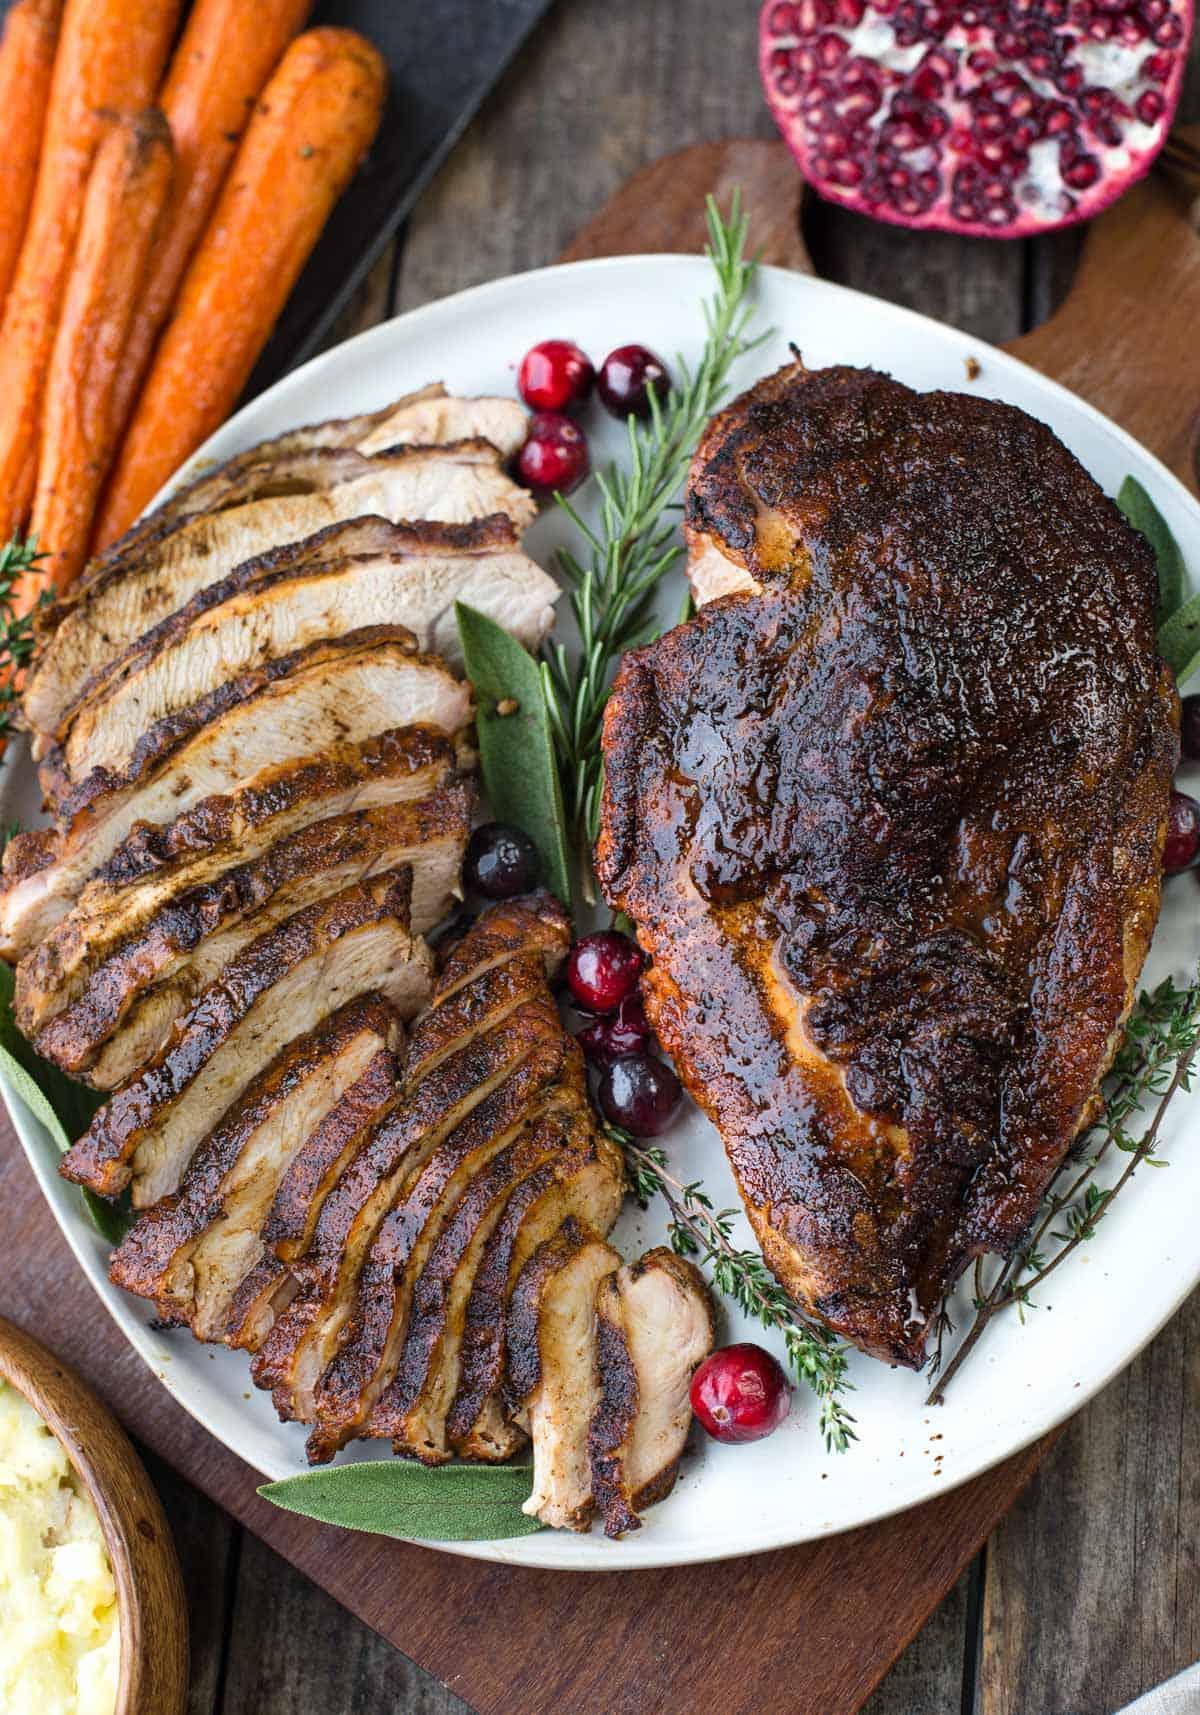 Grilled Turkey Breast with Cajun Seasoning.